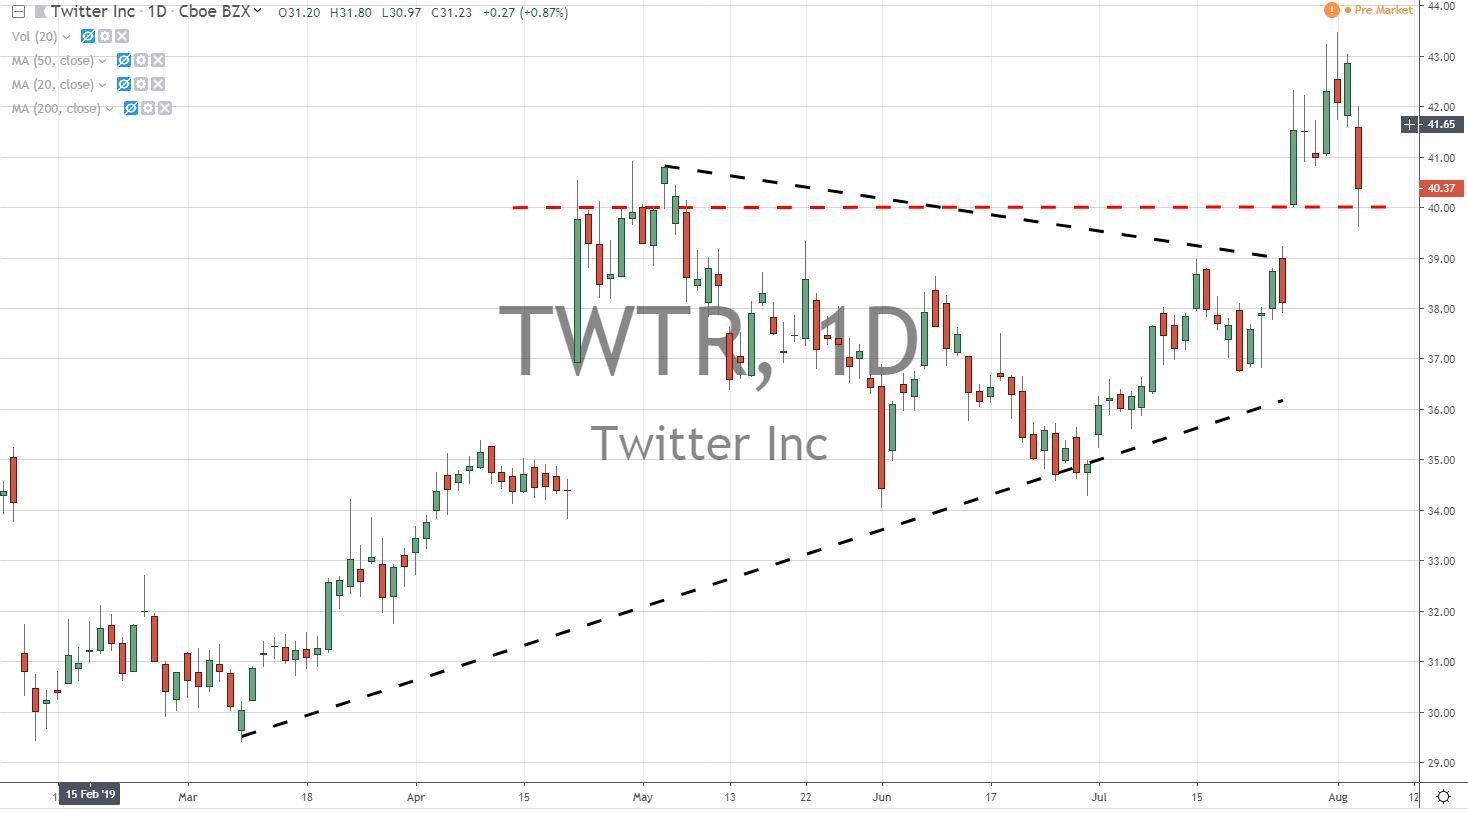 Twitter Inc TWTR Stock Chart 8.6.19